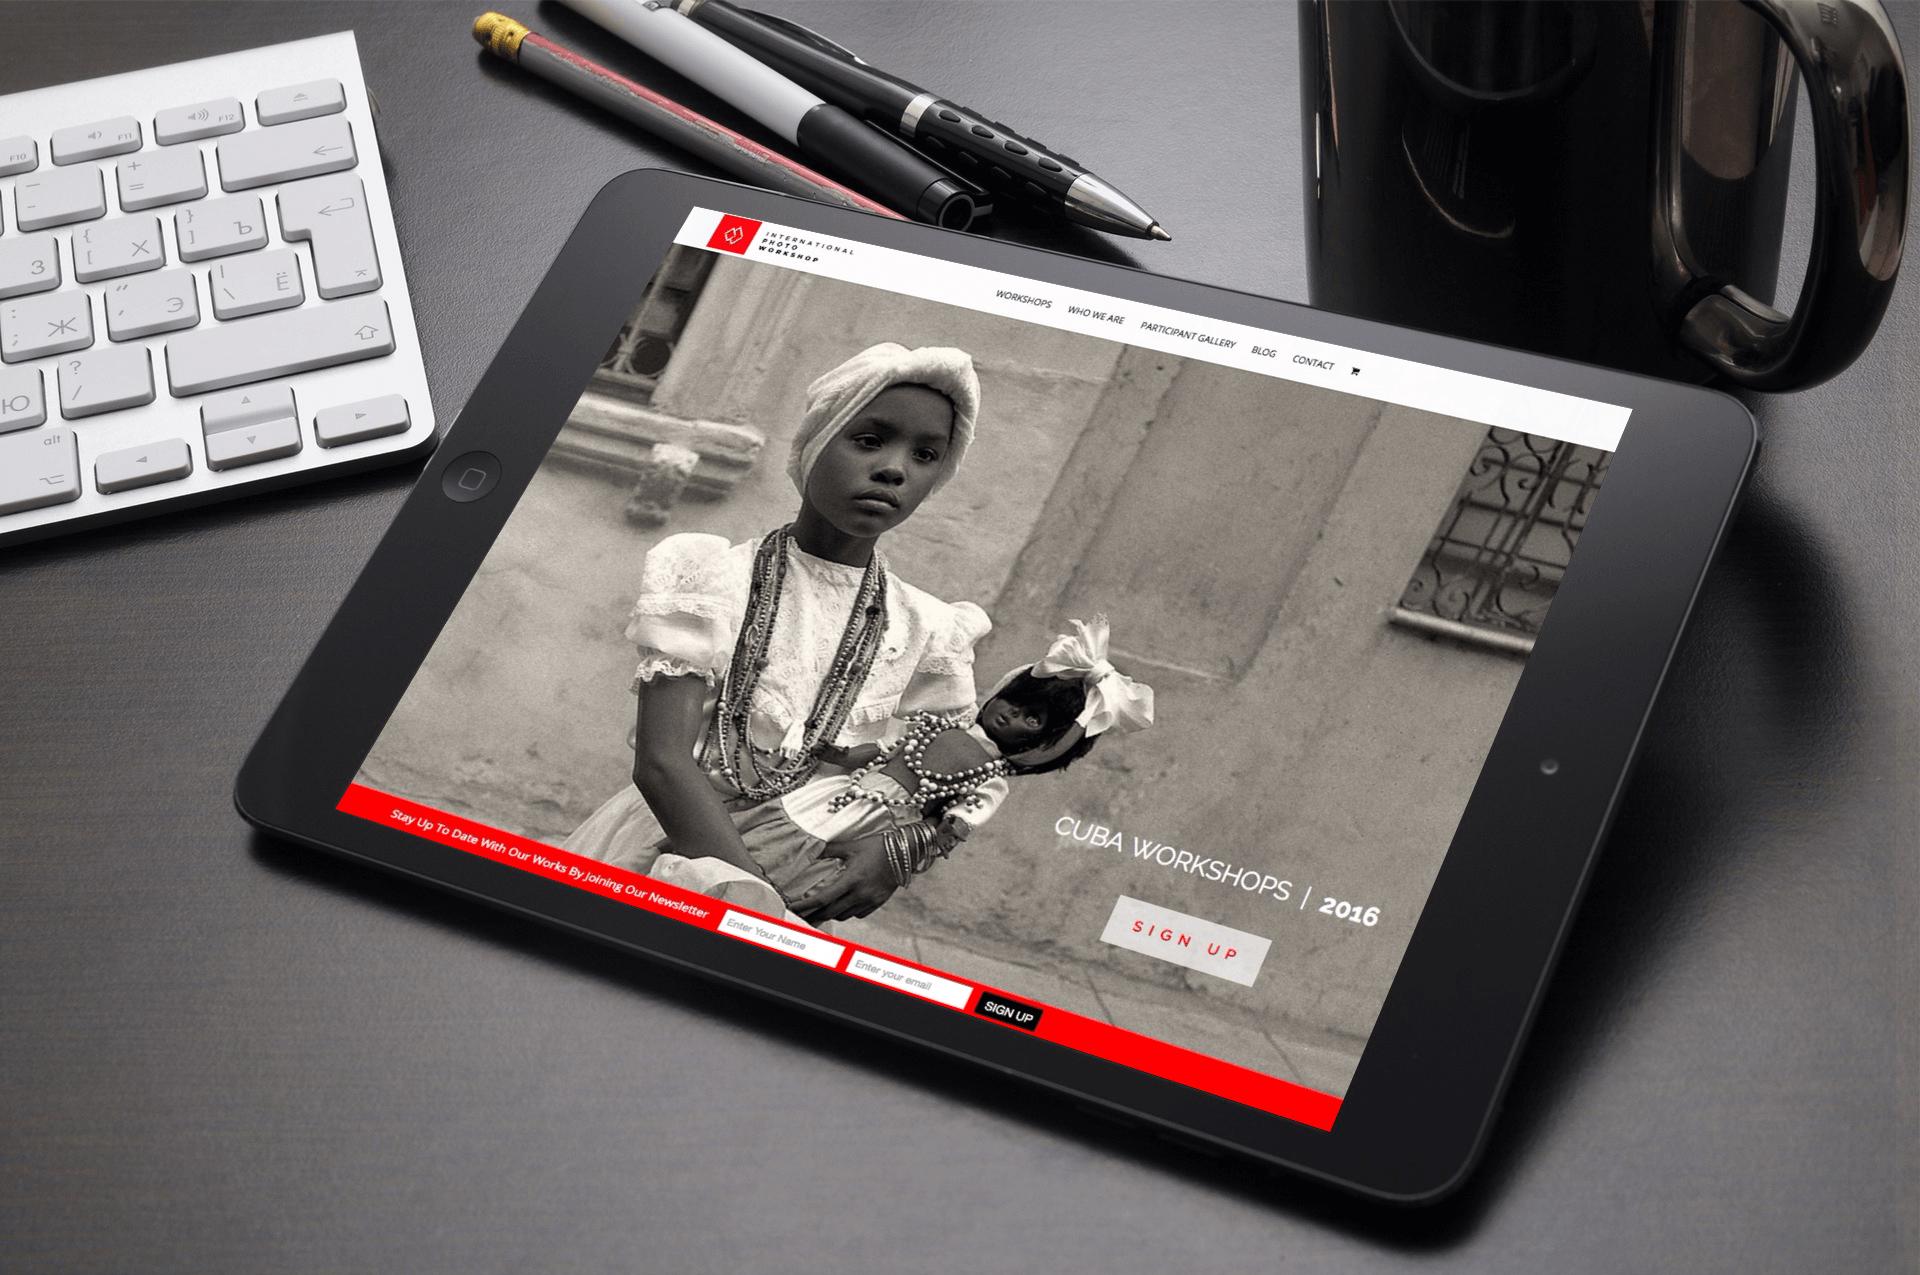 DAVEY DUARTE INTERNATIONAL PHOTO WORKSHOP UI UX DESIGN